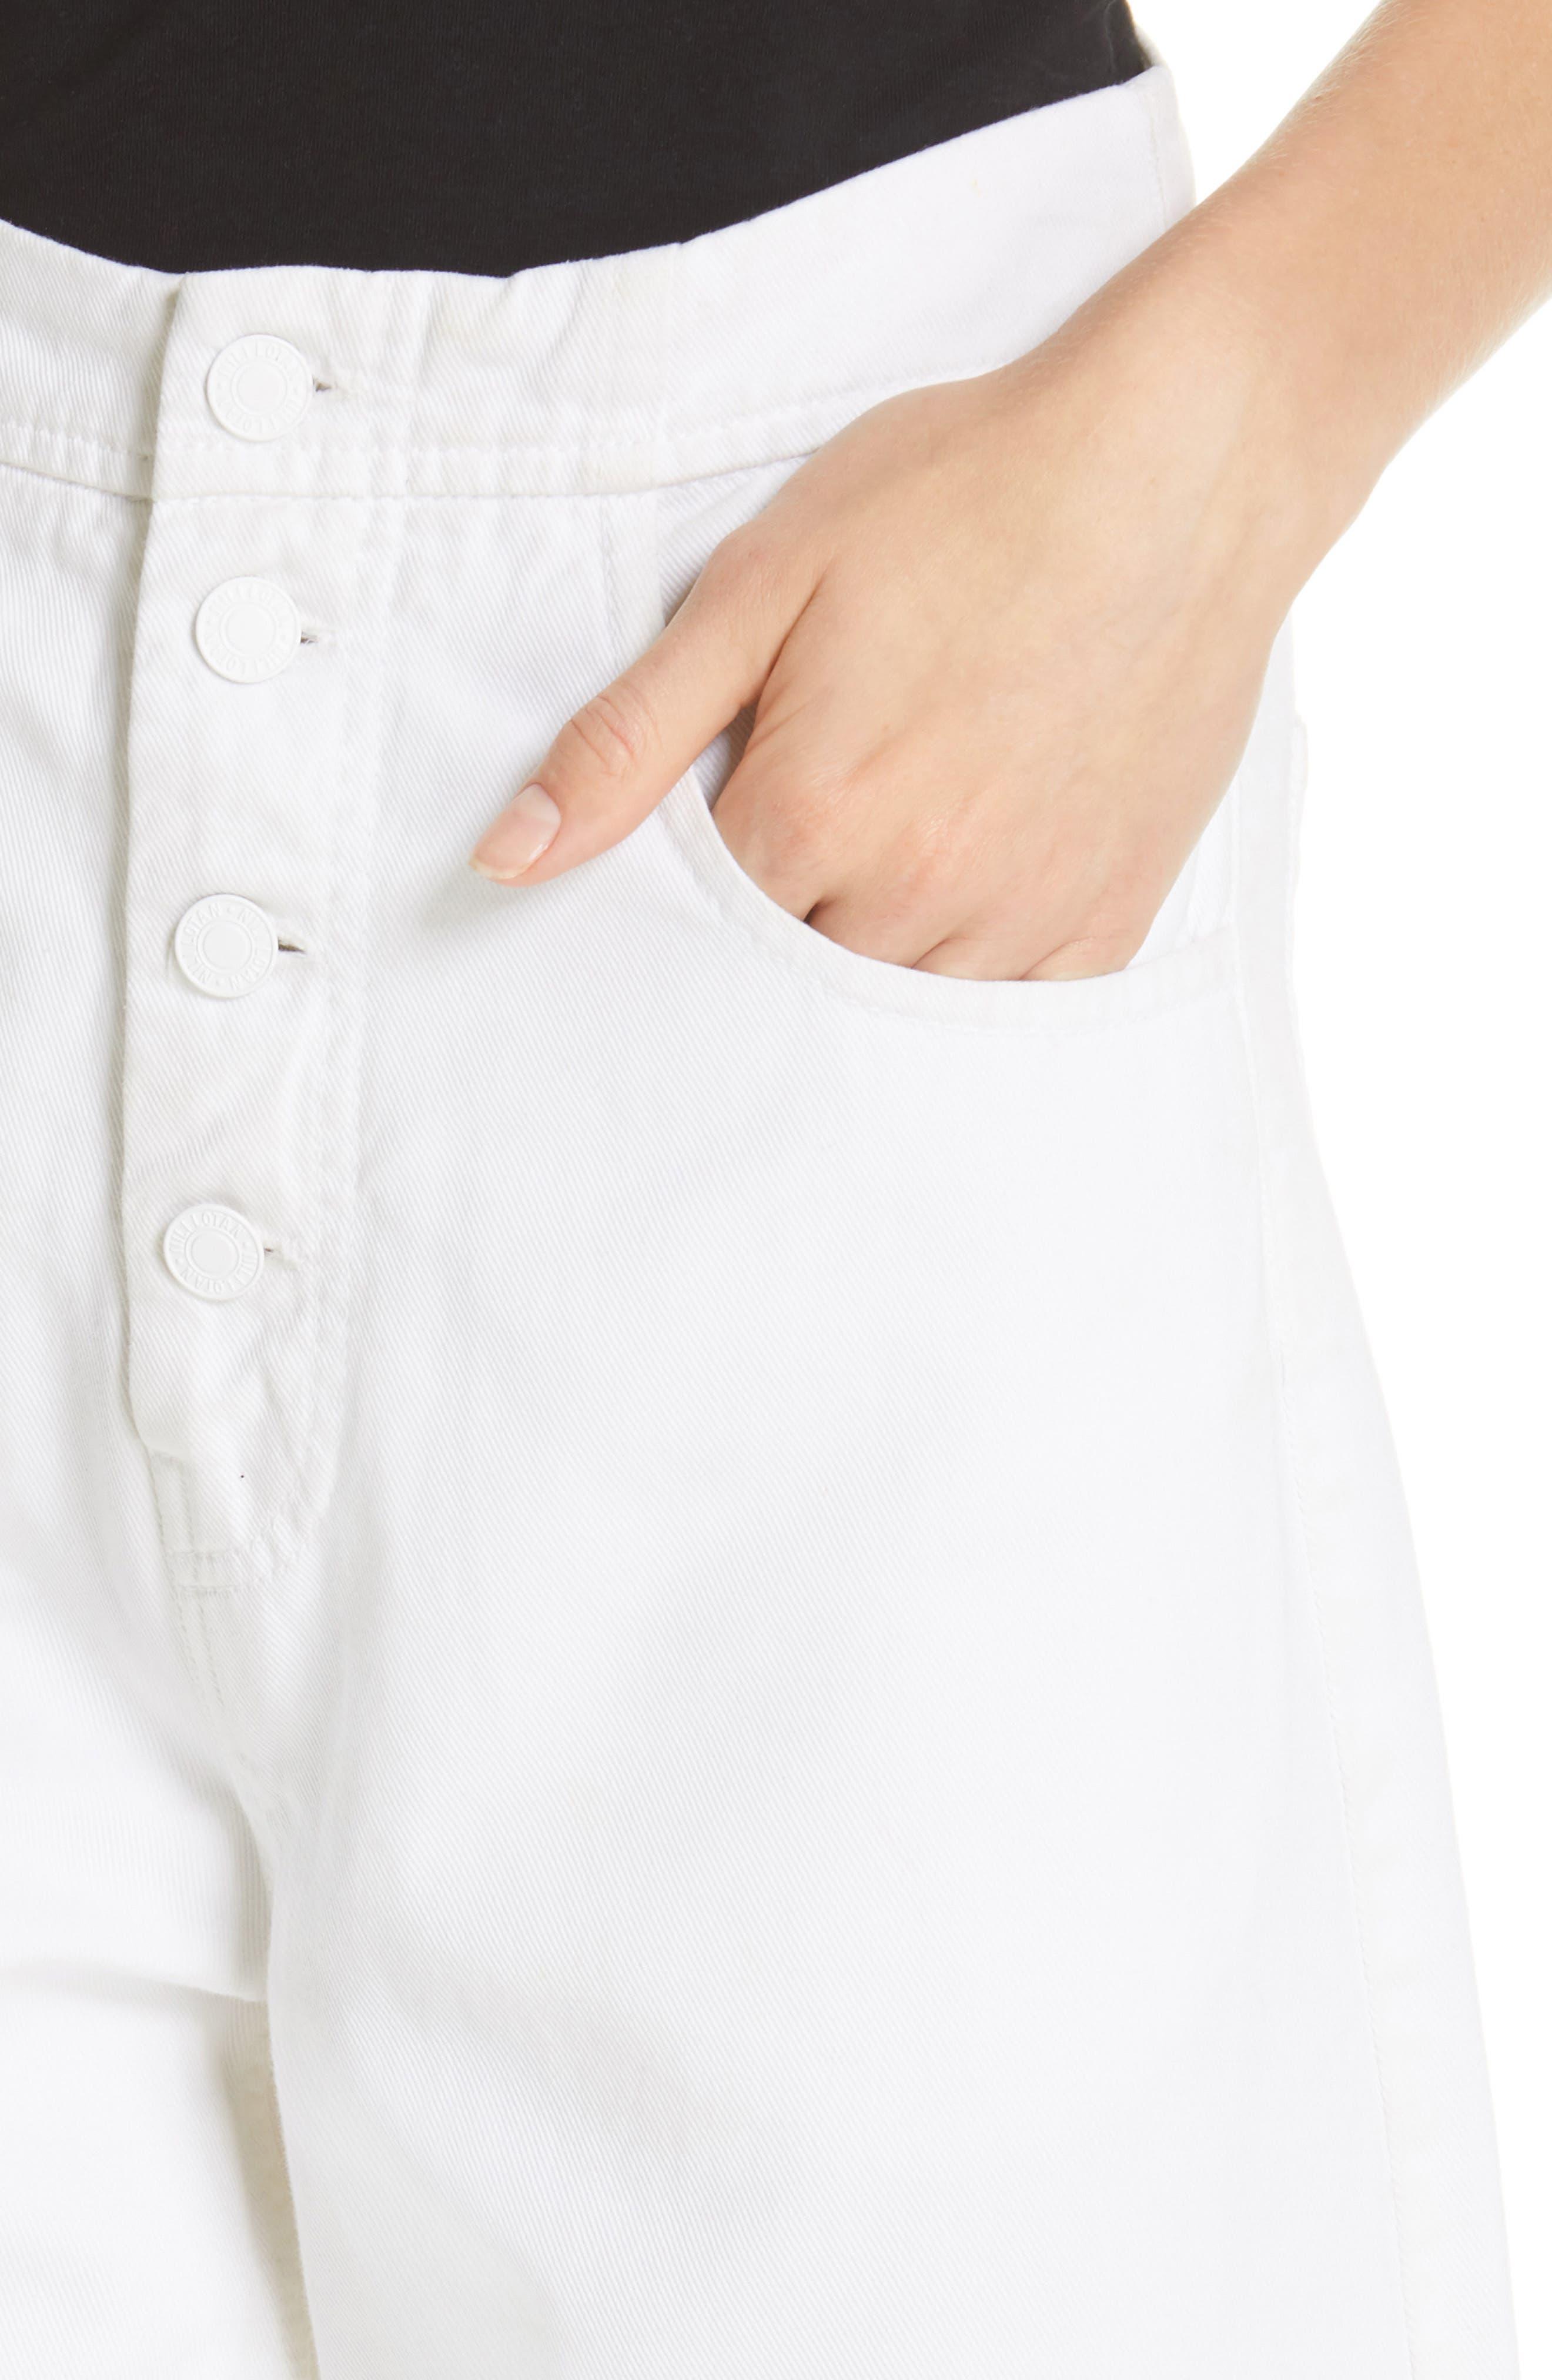 NILI LOTAN, Toledo Crop Cotton Pants, Alternate thumbnail 5, color, VINTAGE WHITE